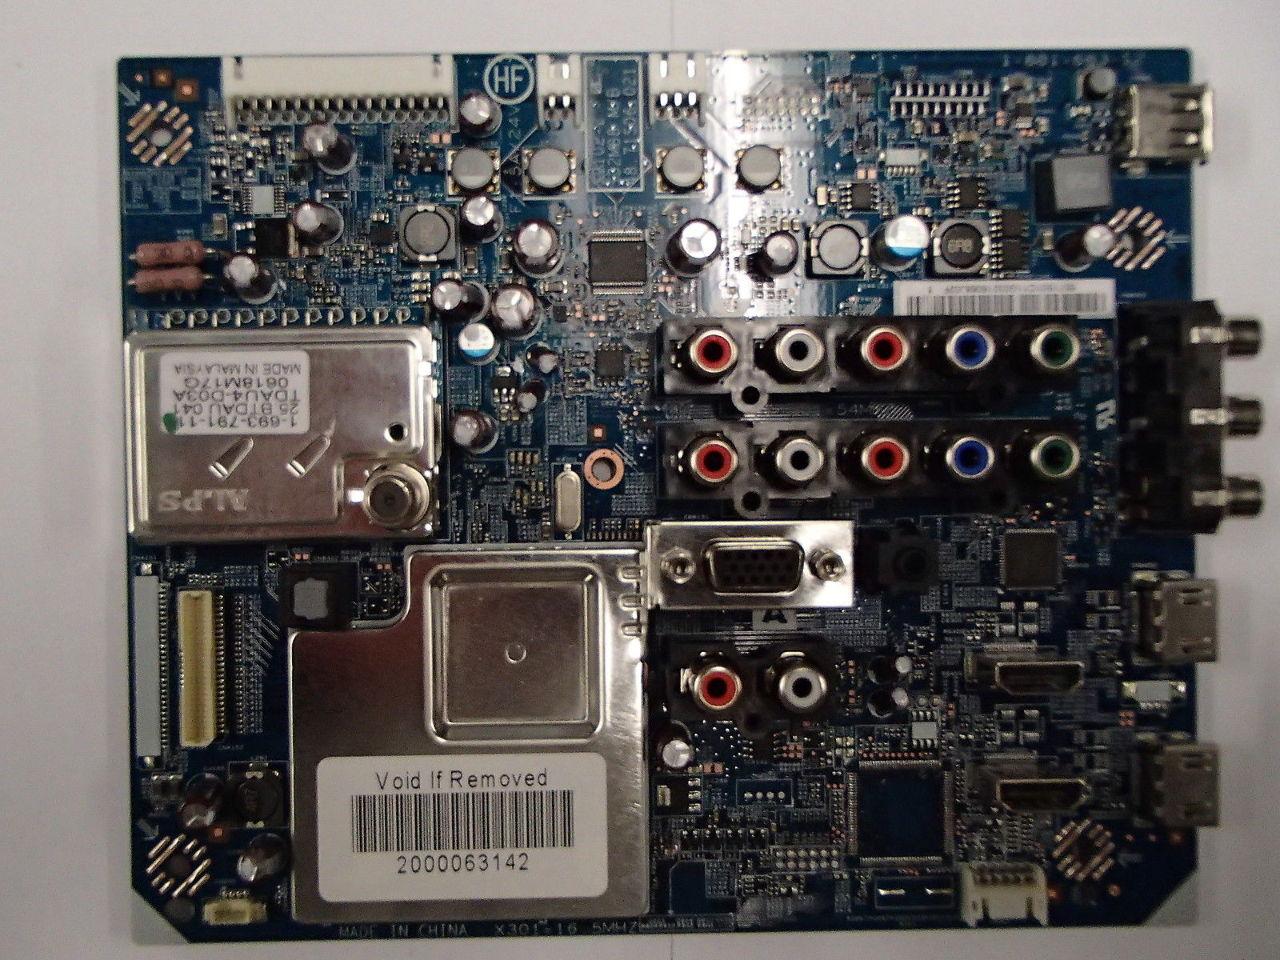 sony 32 kdl 32ex400 kdl 40ex400 kdl 46ex405 55 71s01 c11 main video rh ebay com Sony Owner's Manual Online Sony Owner's Manual Online